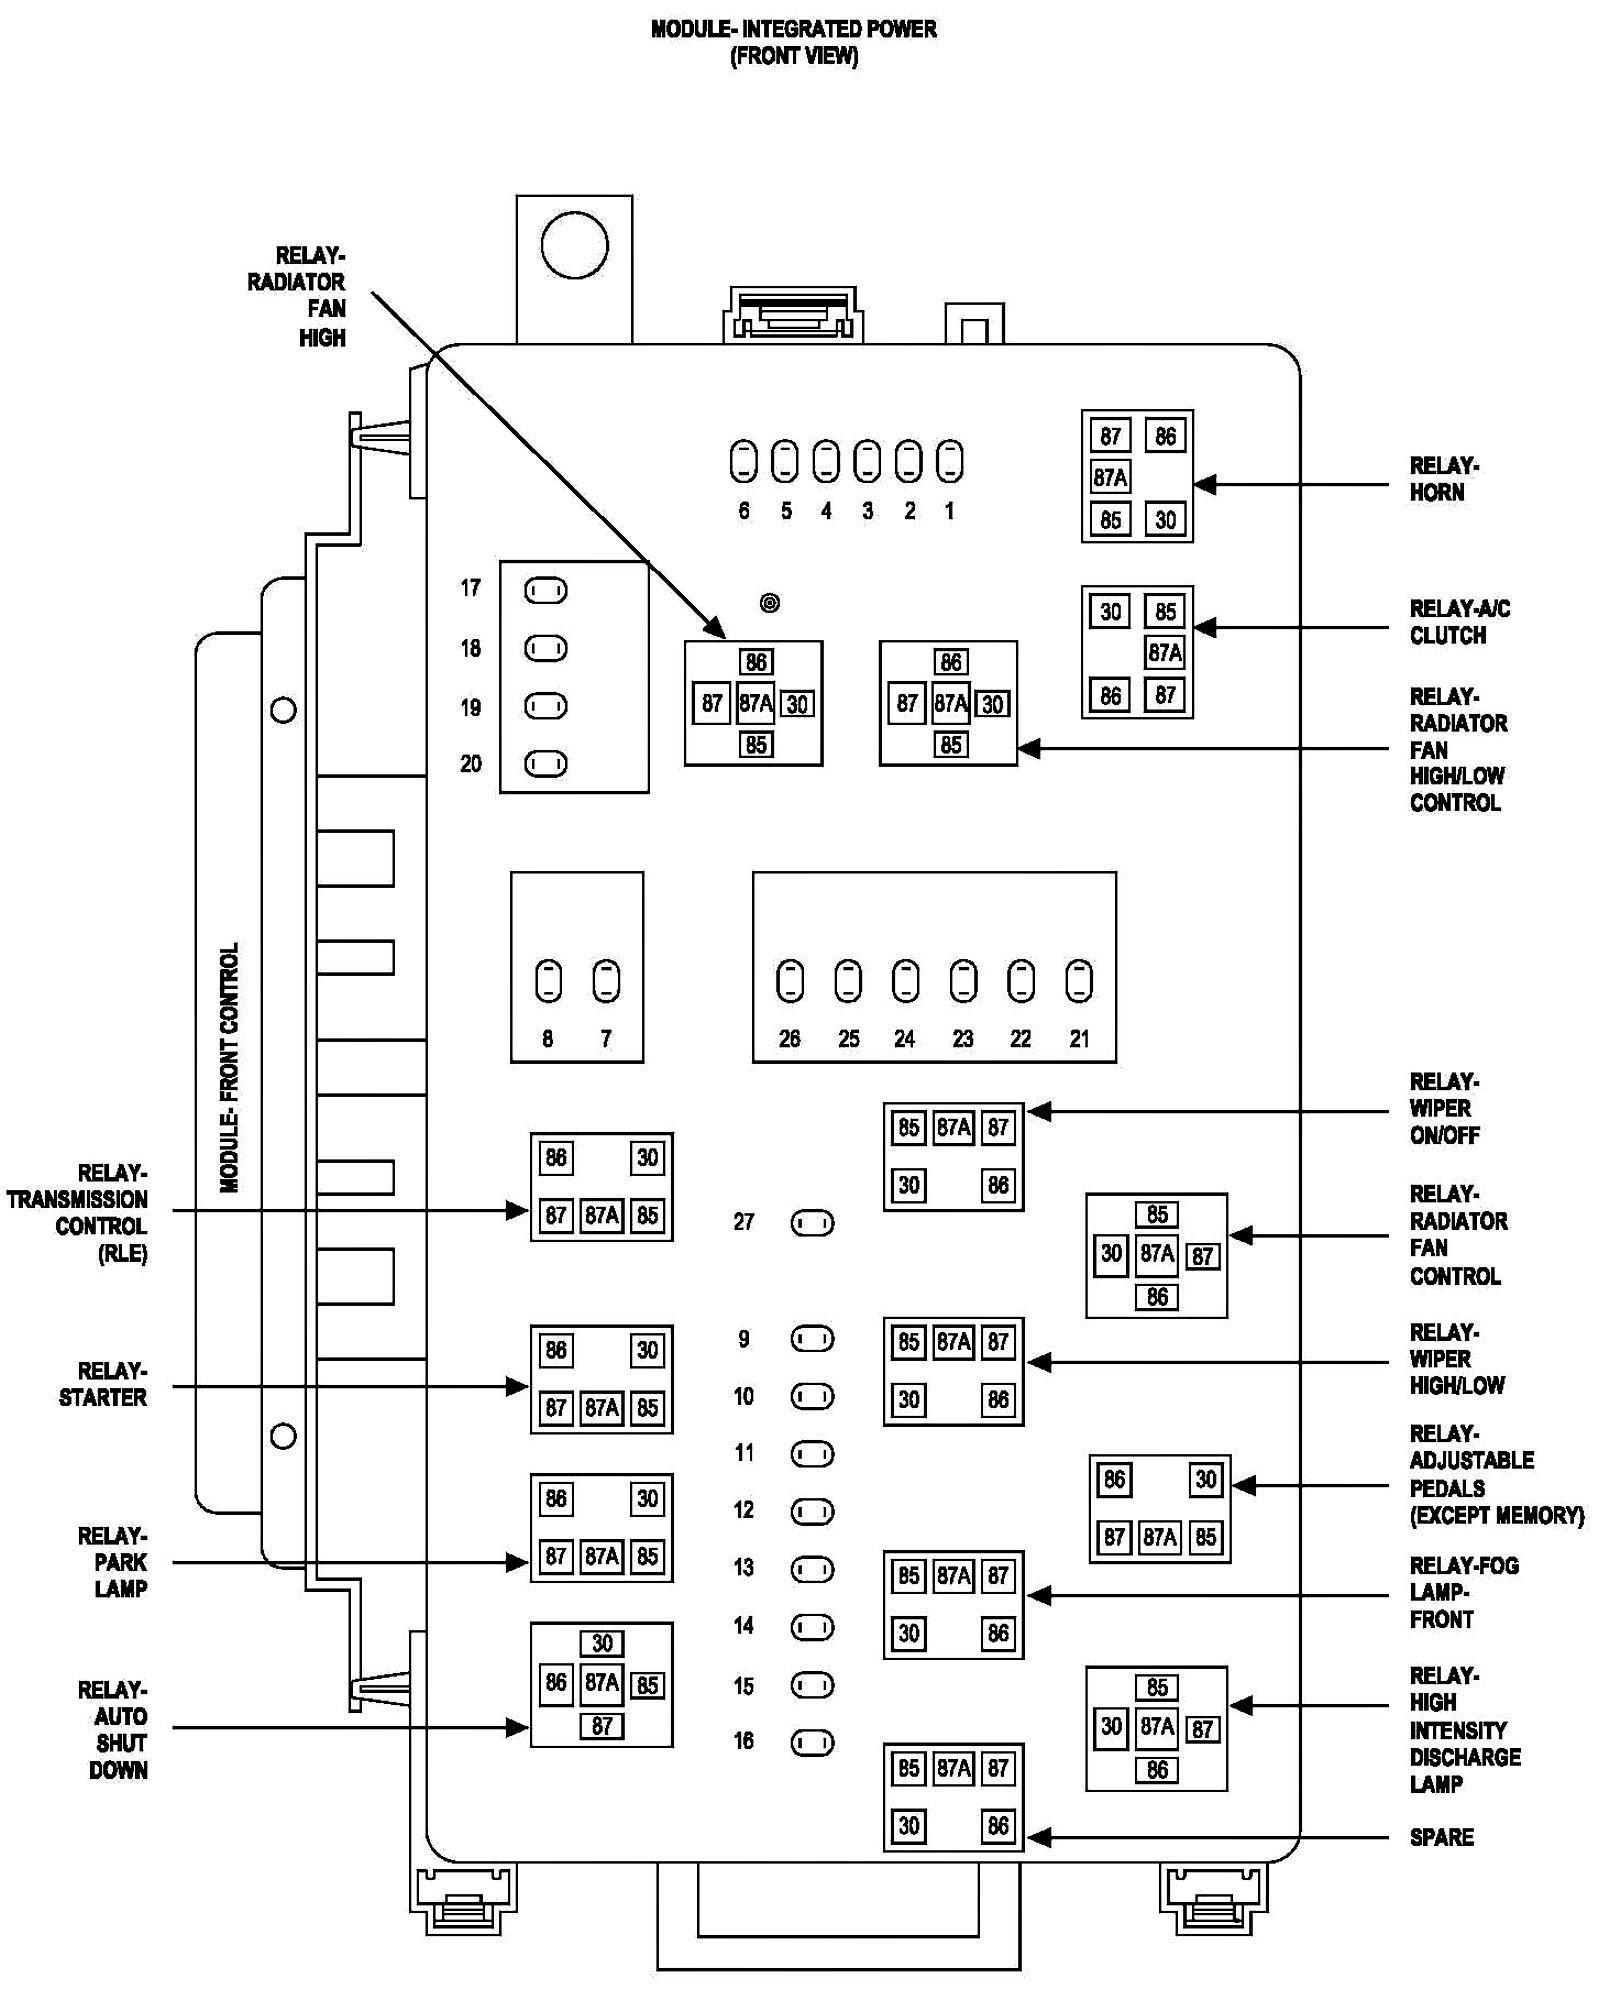 2007 Chrysler Sebring Fuse Box Diagram